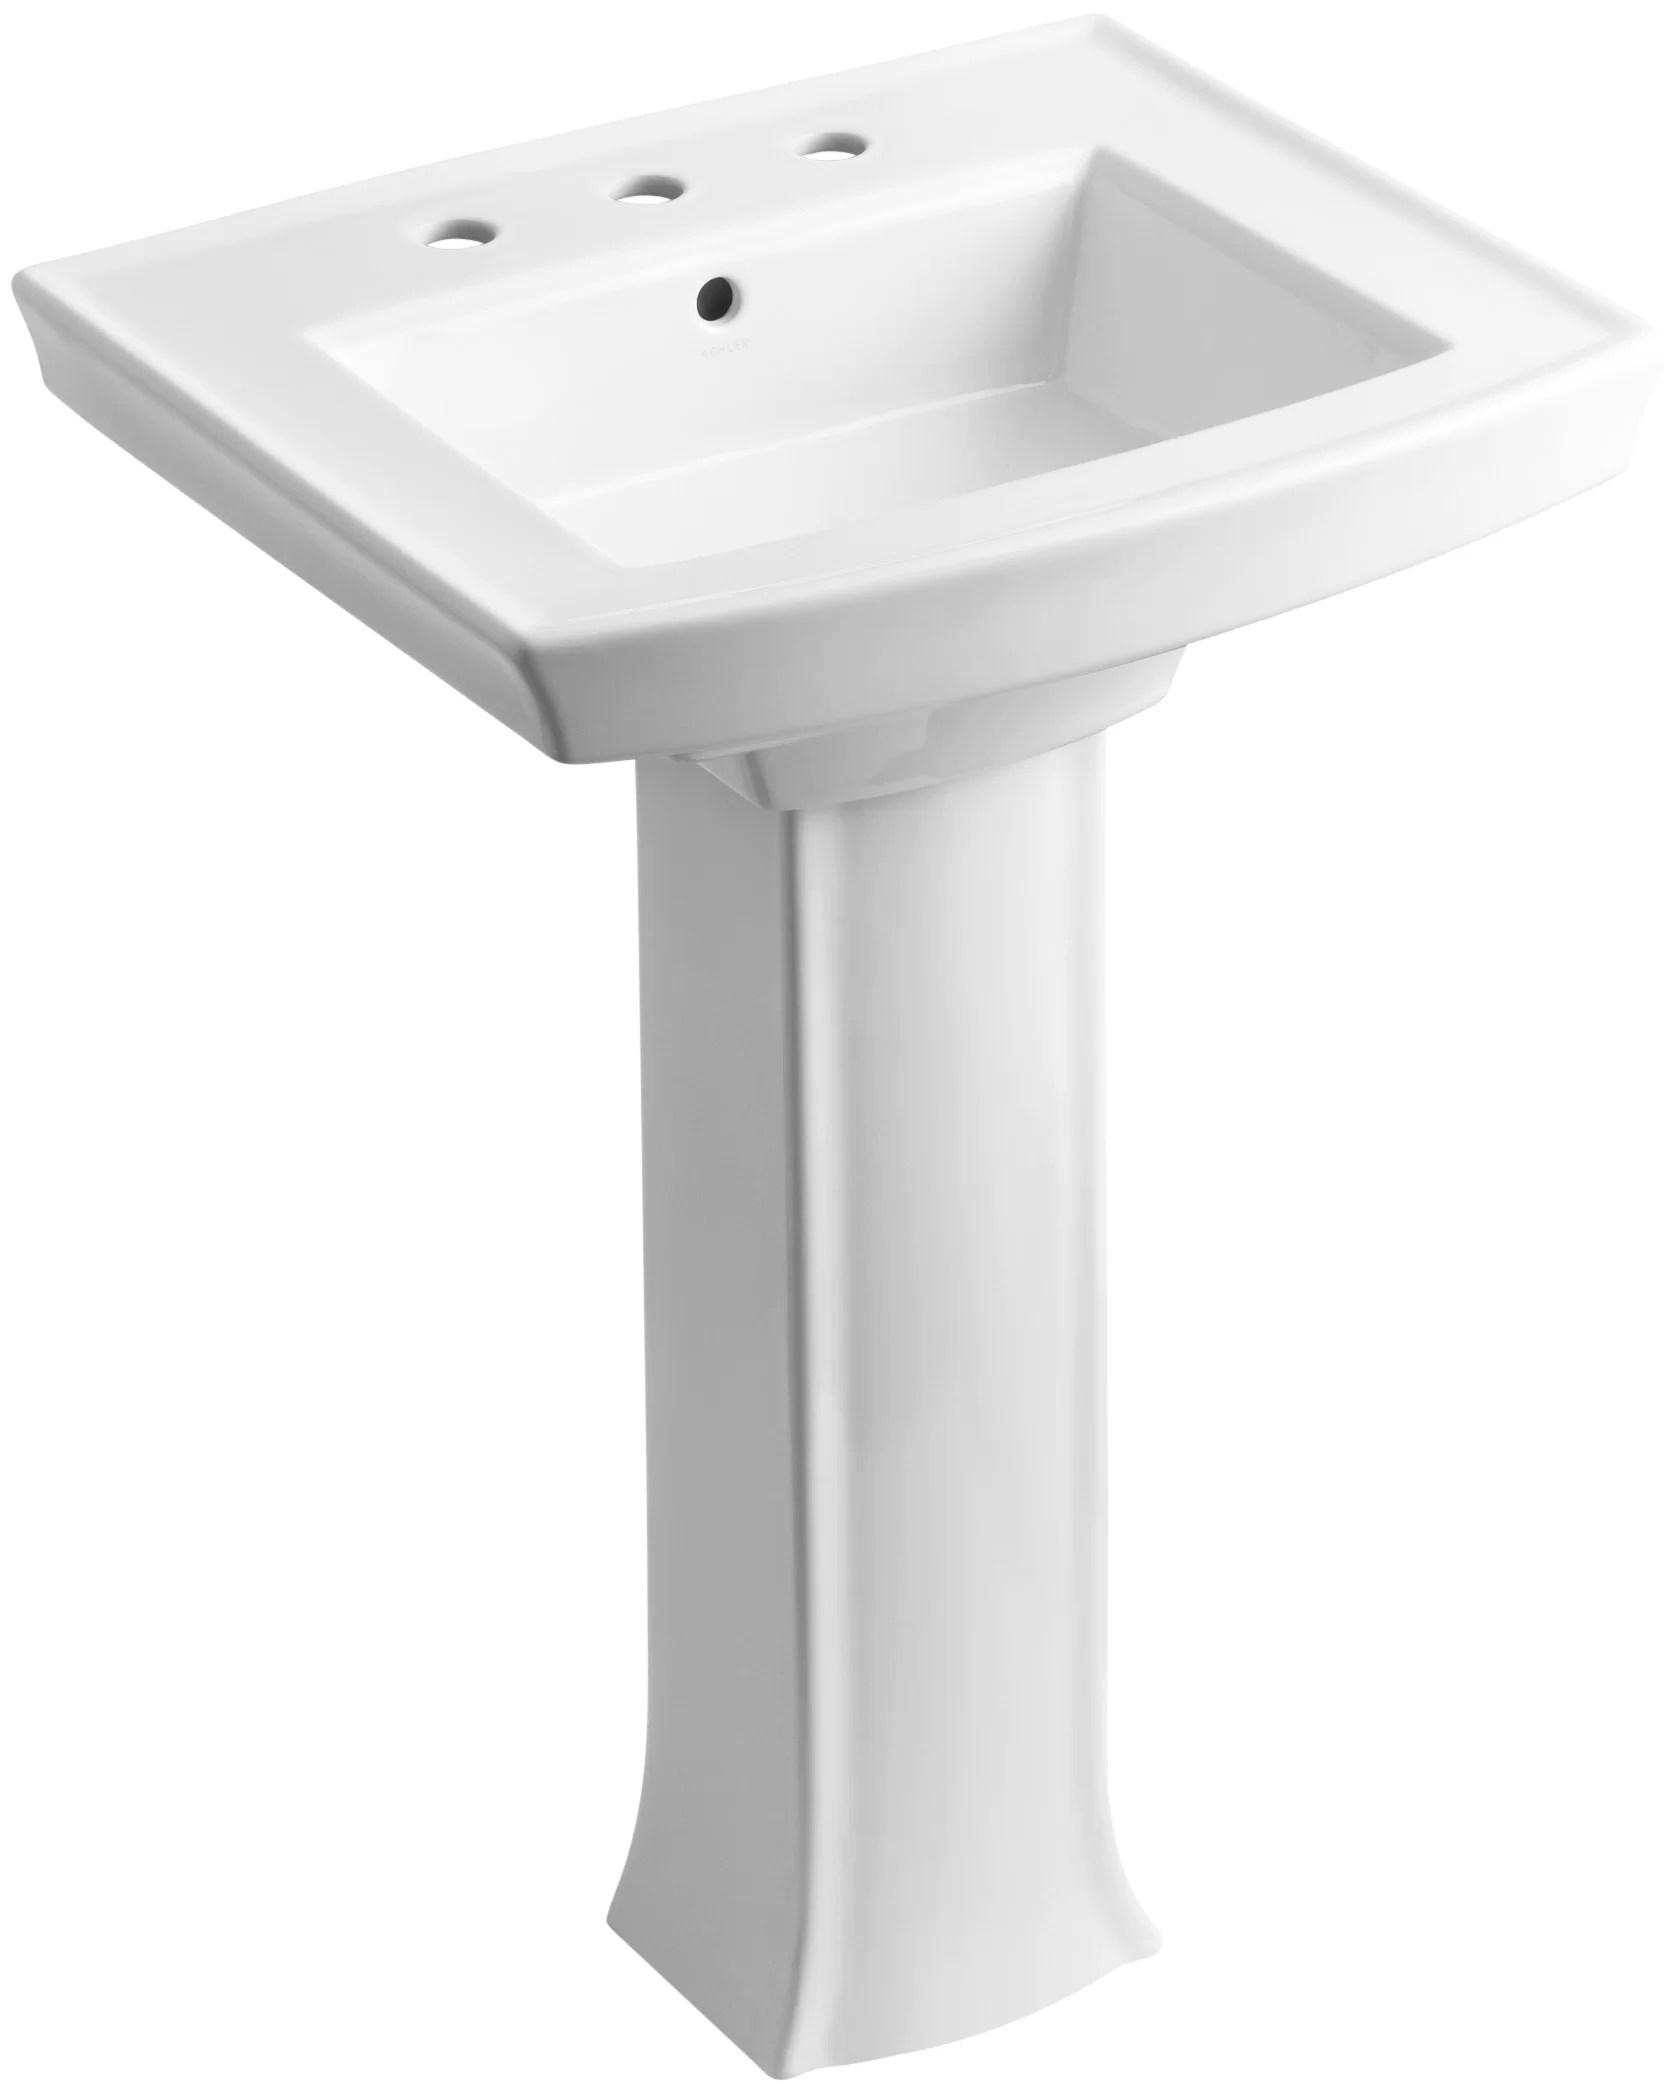 thunder grey kohler k 2359 8 58 archer pedestal bathroom sink with 8 centers pedestal sinks bonsaipaisajismo kitchen bath fixtures